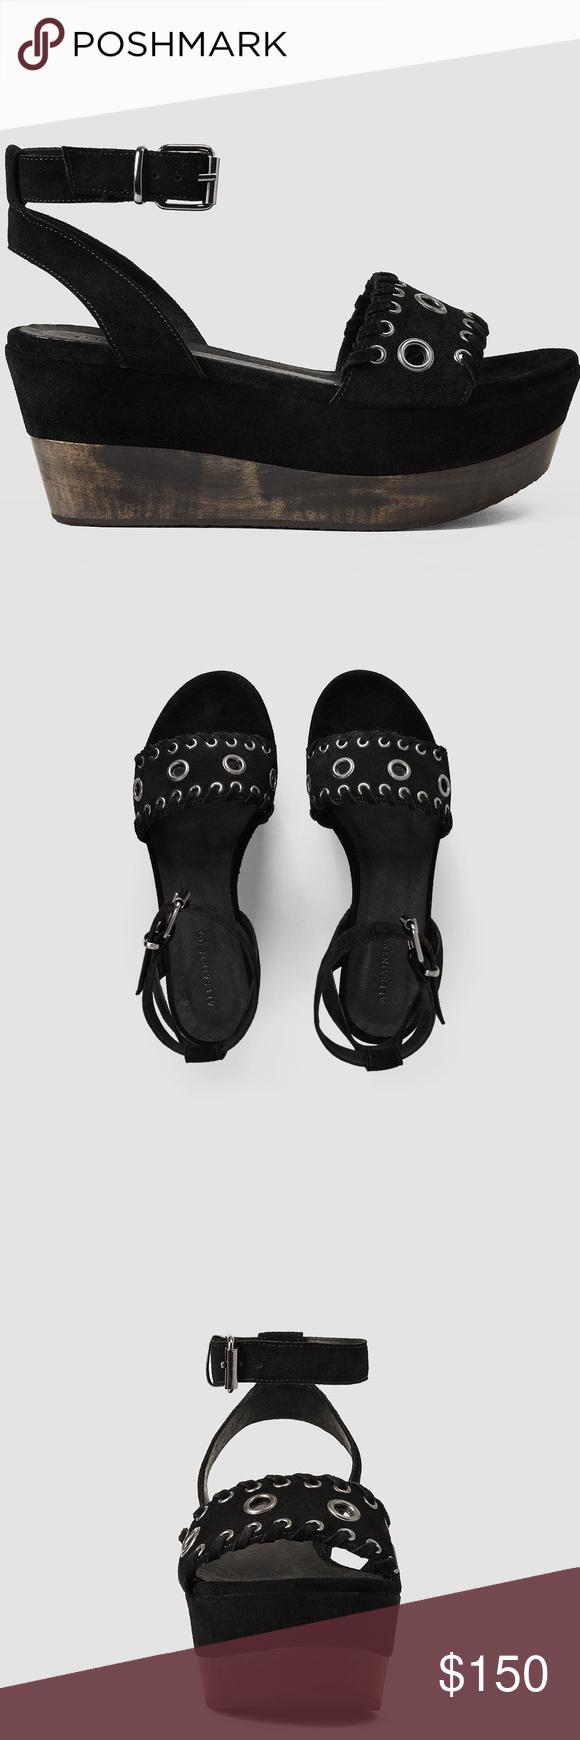 AllSaints Yuki Black Suede Platform Hardware Shoes Shoes